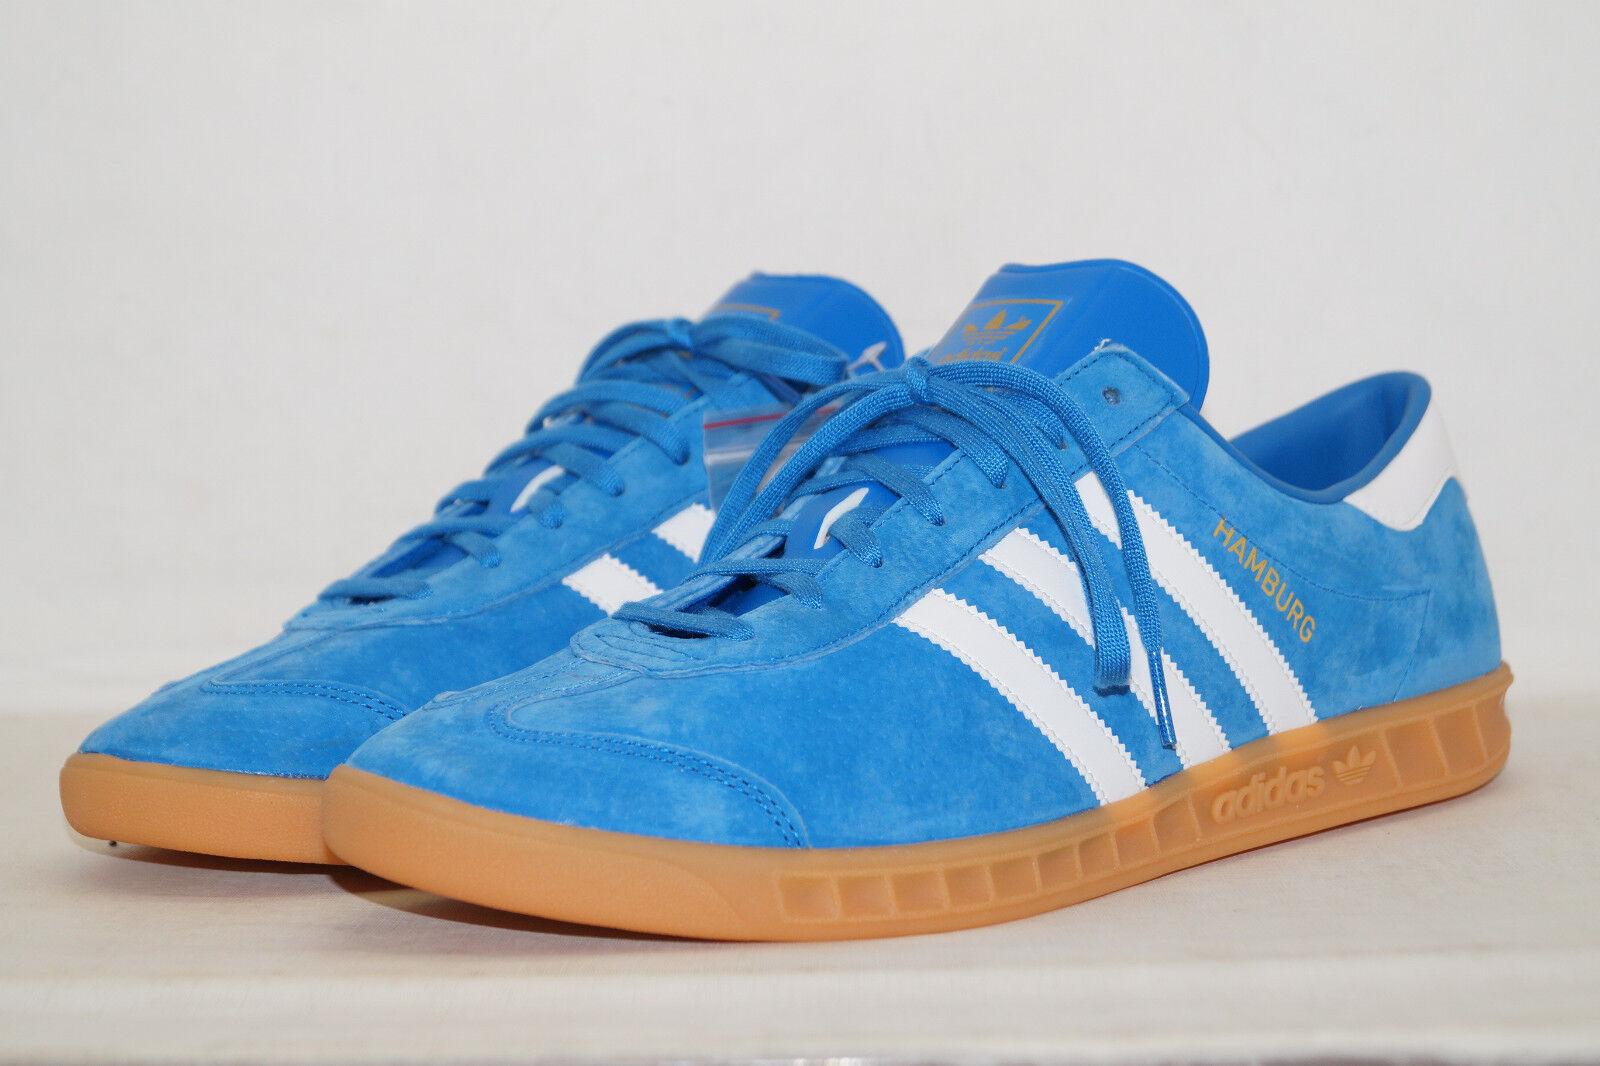 Adidas Originals Baskets Hambourg Bleu s76697 Baskets Originals Sport Chaussures 4952f7